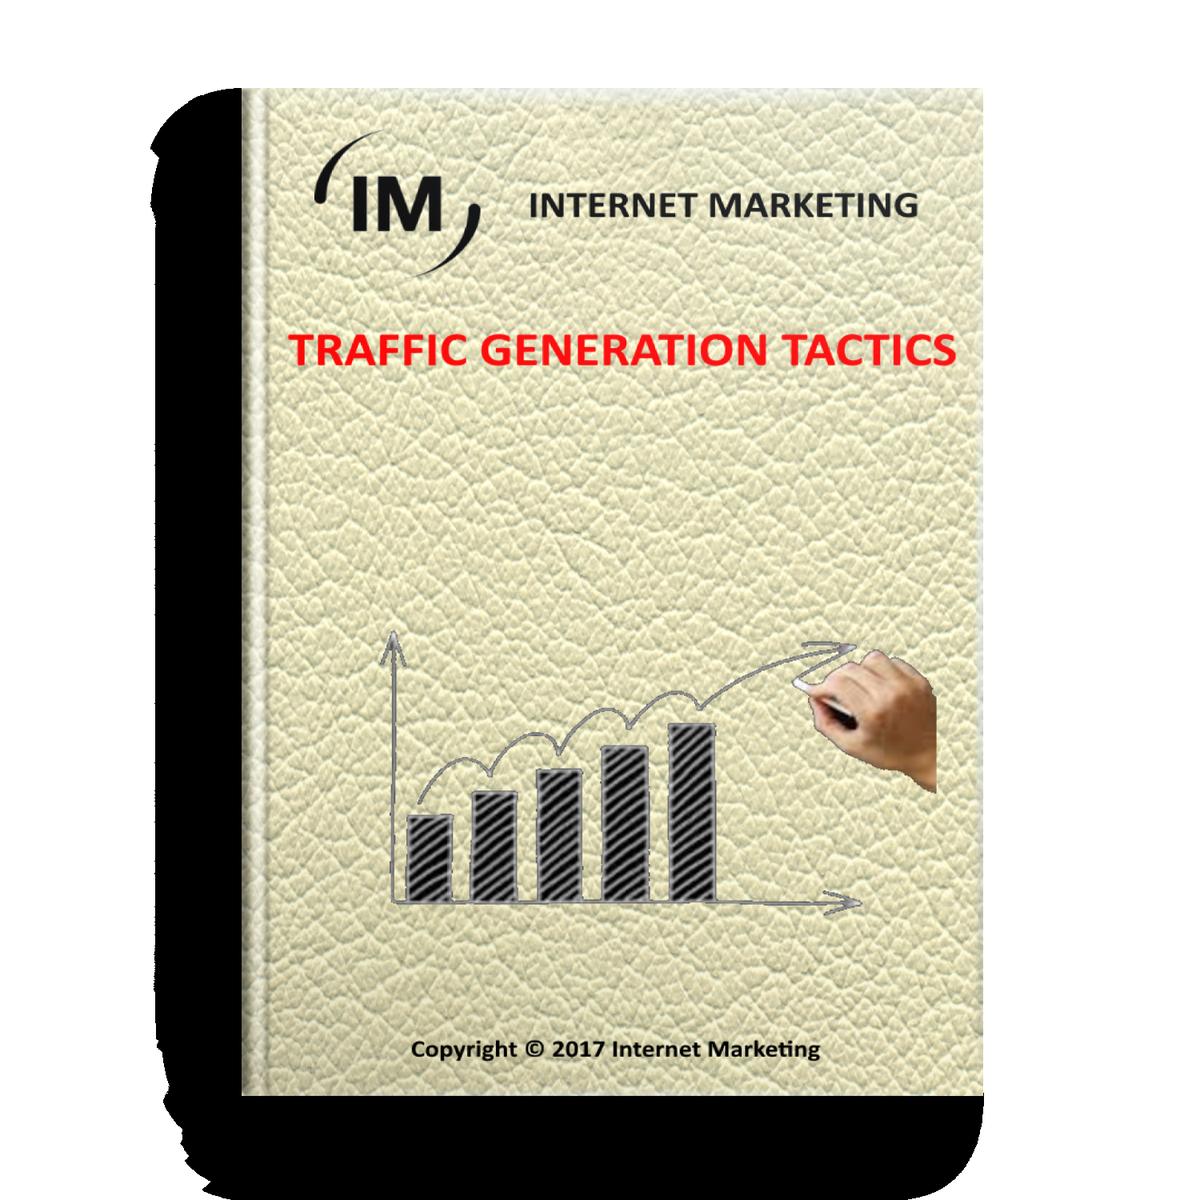 Traffic Generation Tactics  https:// payhip.com/b/yFKx  &nbsp;   #training #Tips #sales #marketing #earn #make #money #business #social #media #online <br>http://pic.twitter.com/buTTlDA1Zx